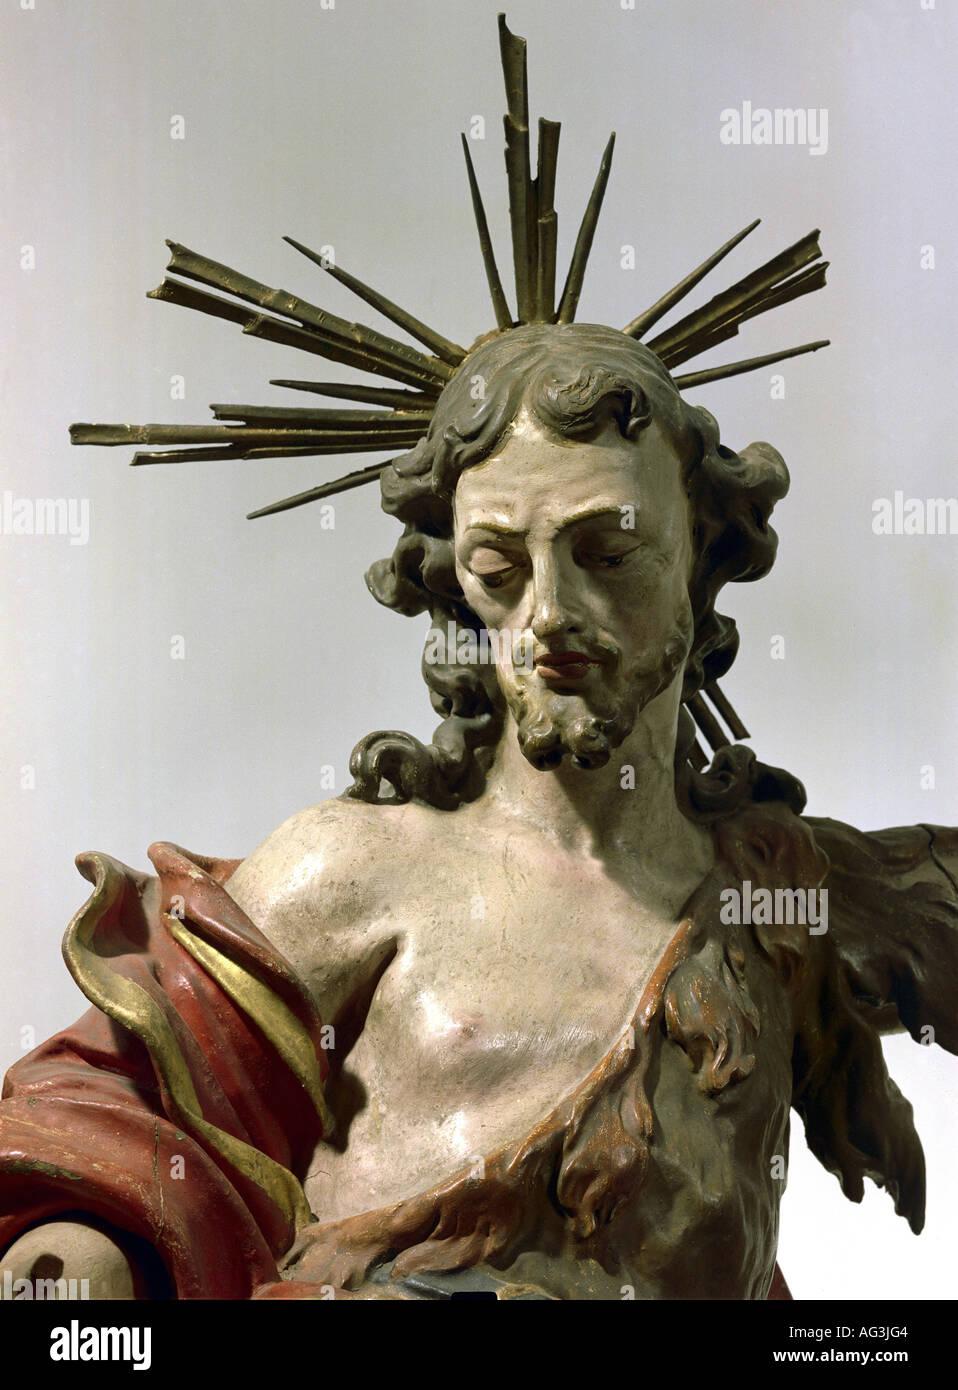 fine arts, sculpture, Saint John the Baptist, 24.6.1 BC - after 29 AD, prophet, martyr, Saint, Tyrolian rococo, Stock Photo